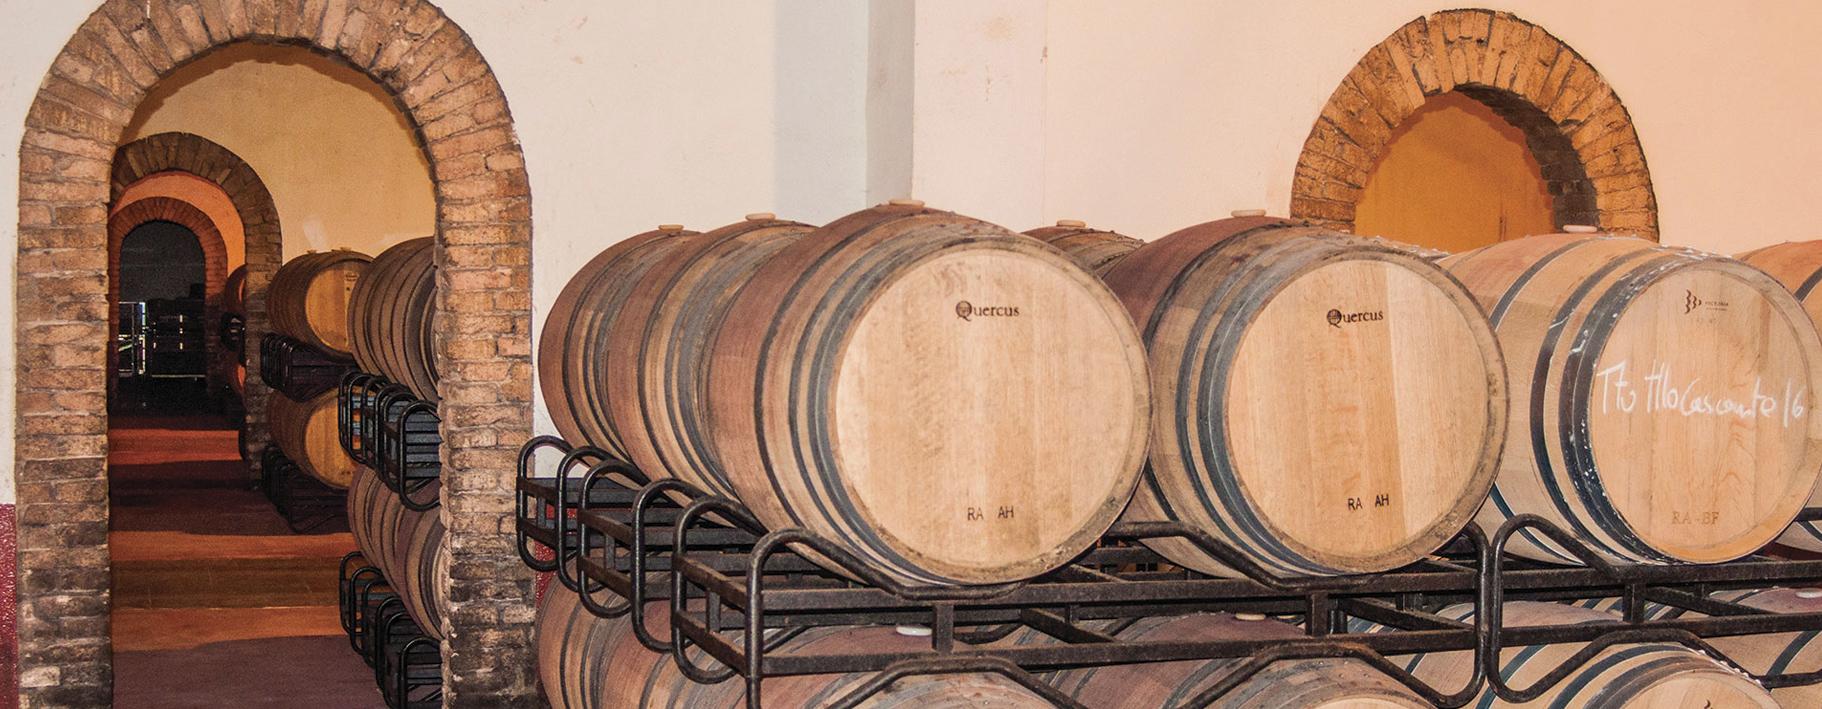 bodegas-manzanos-campanas017